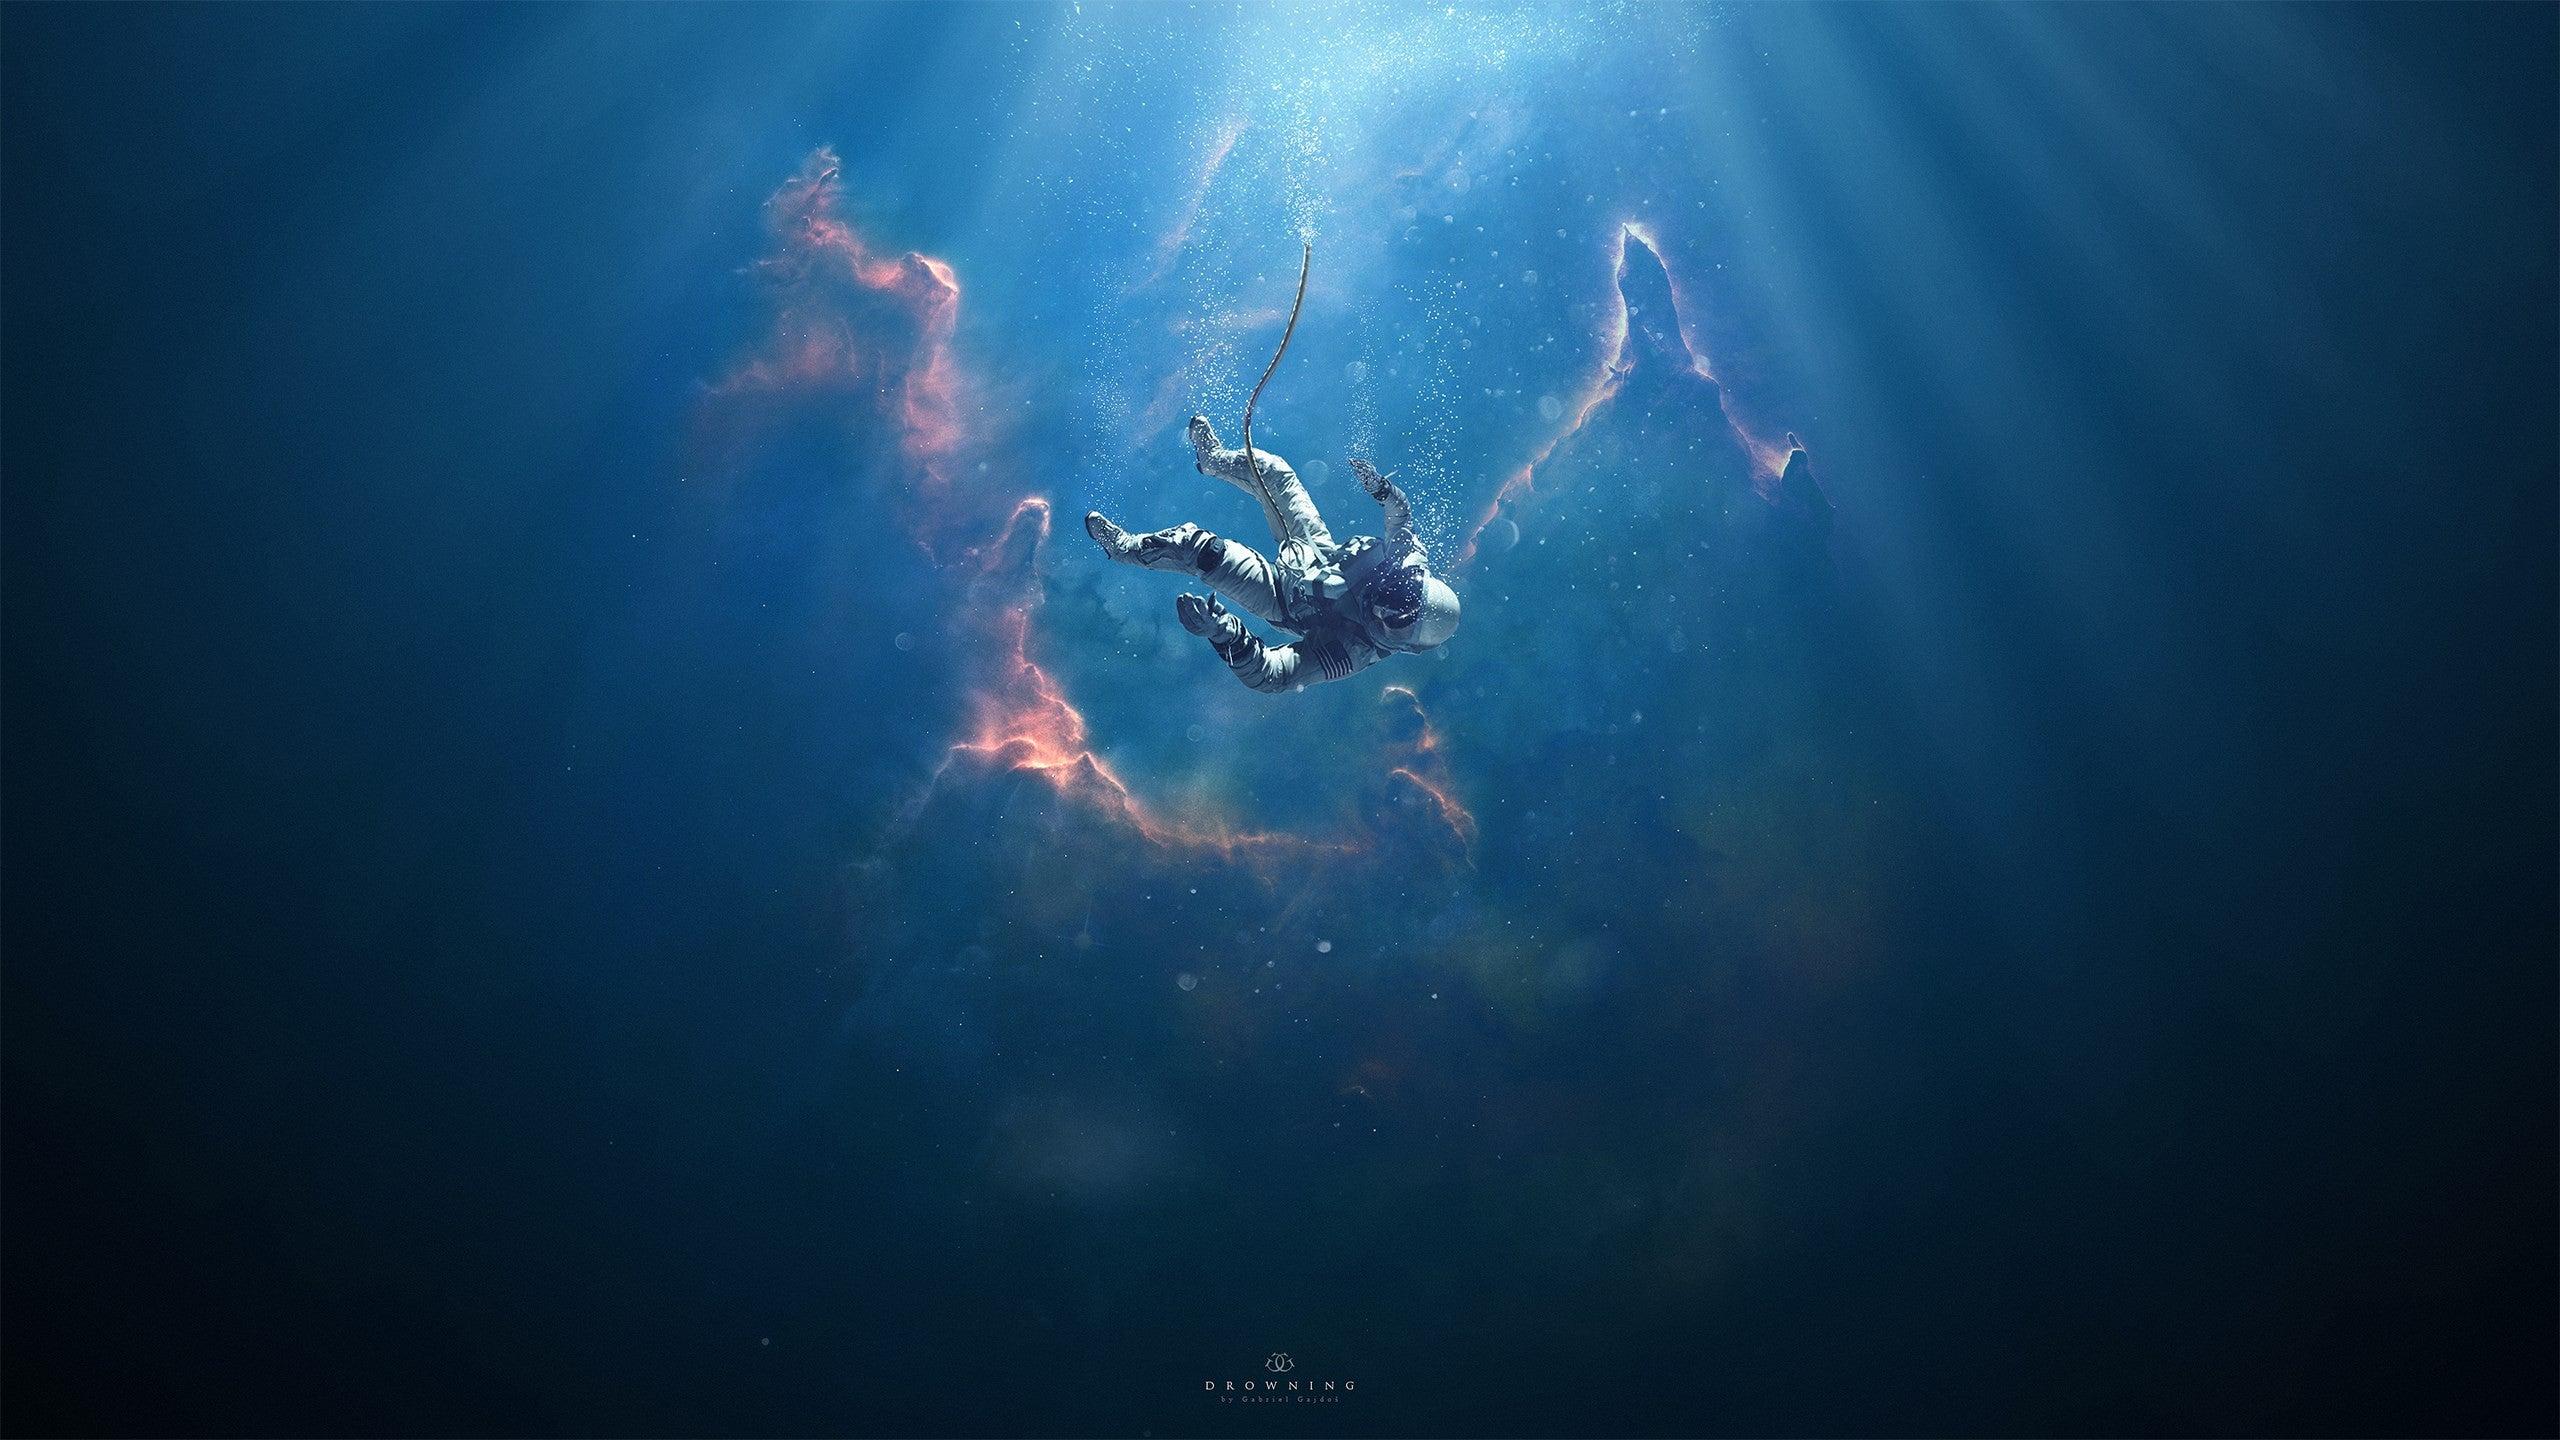 surreal drowning astronaut wallpaper